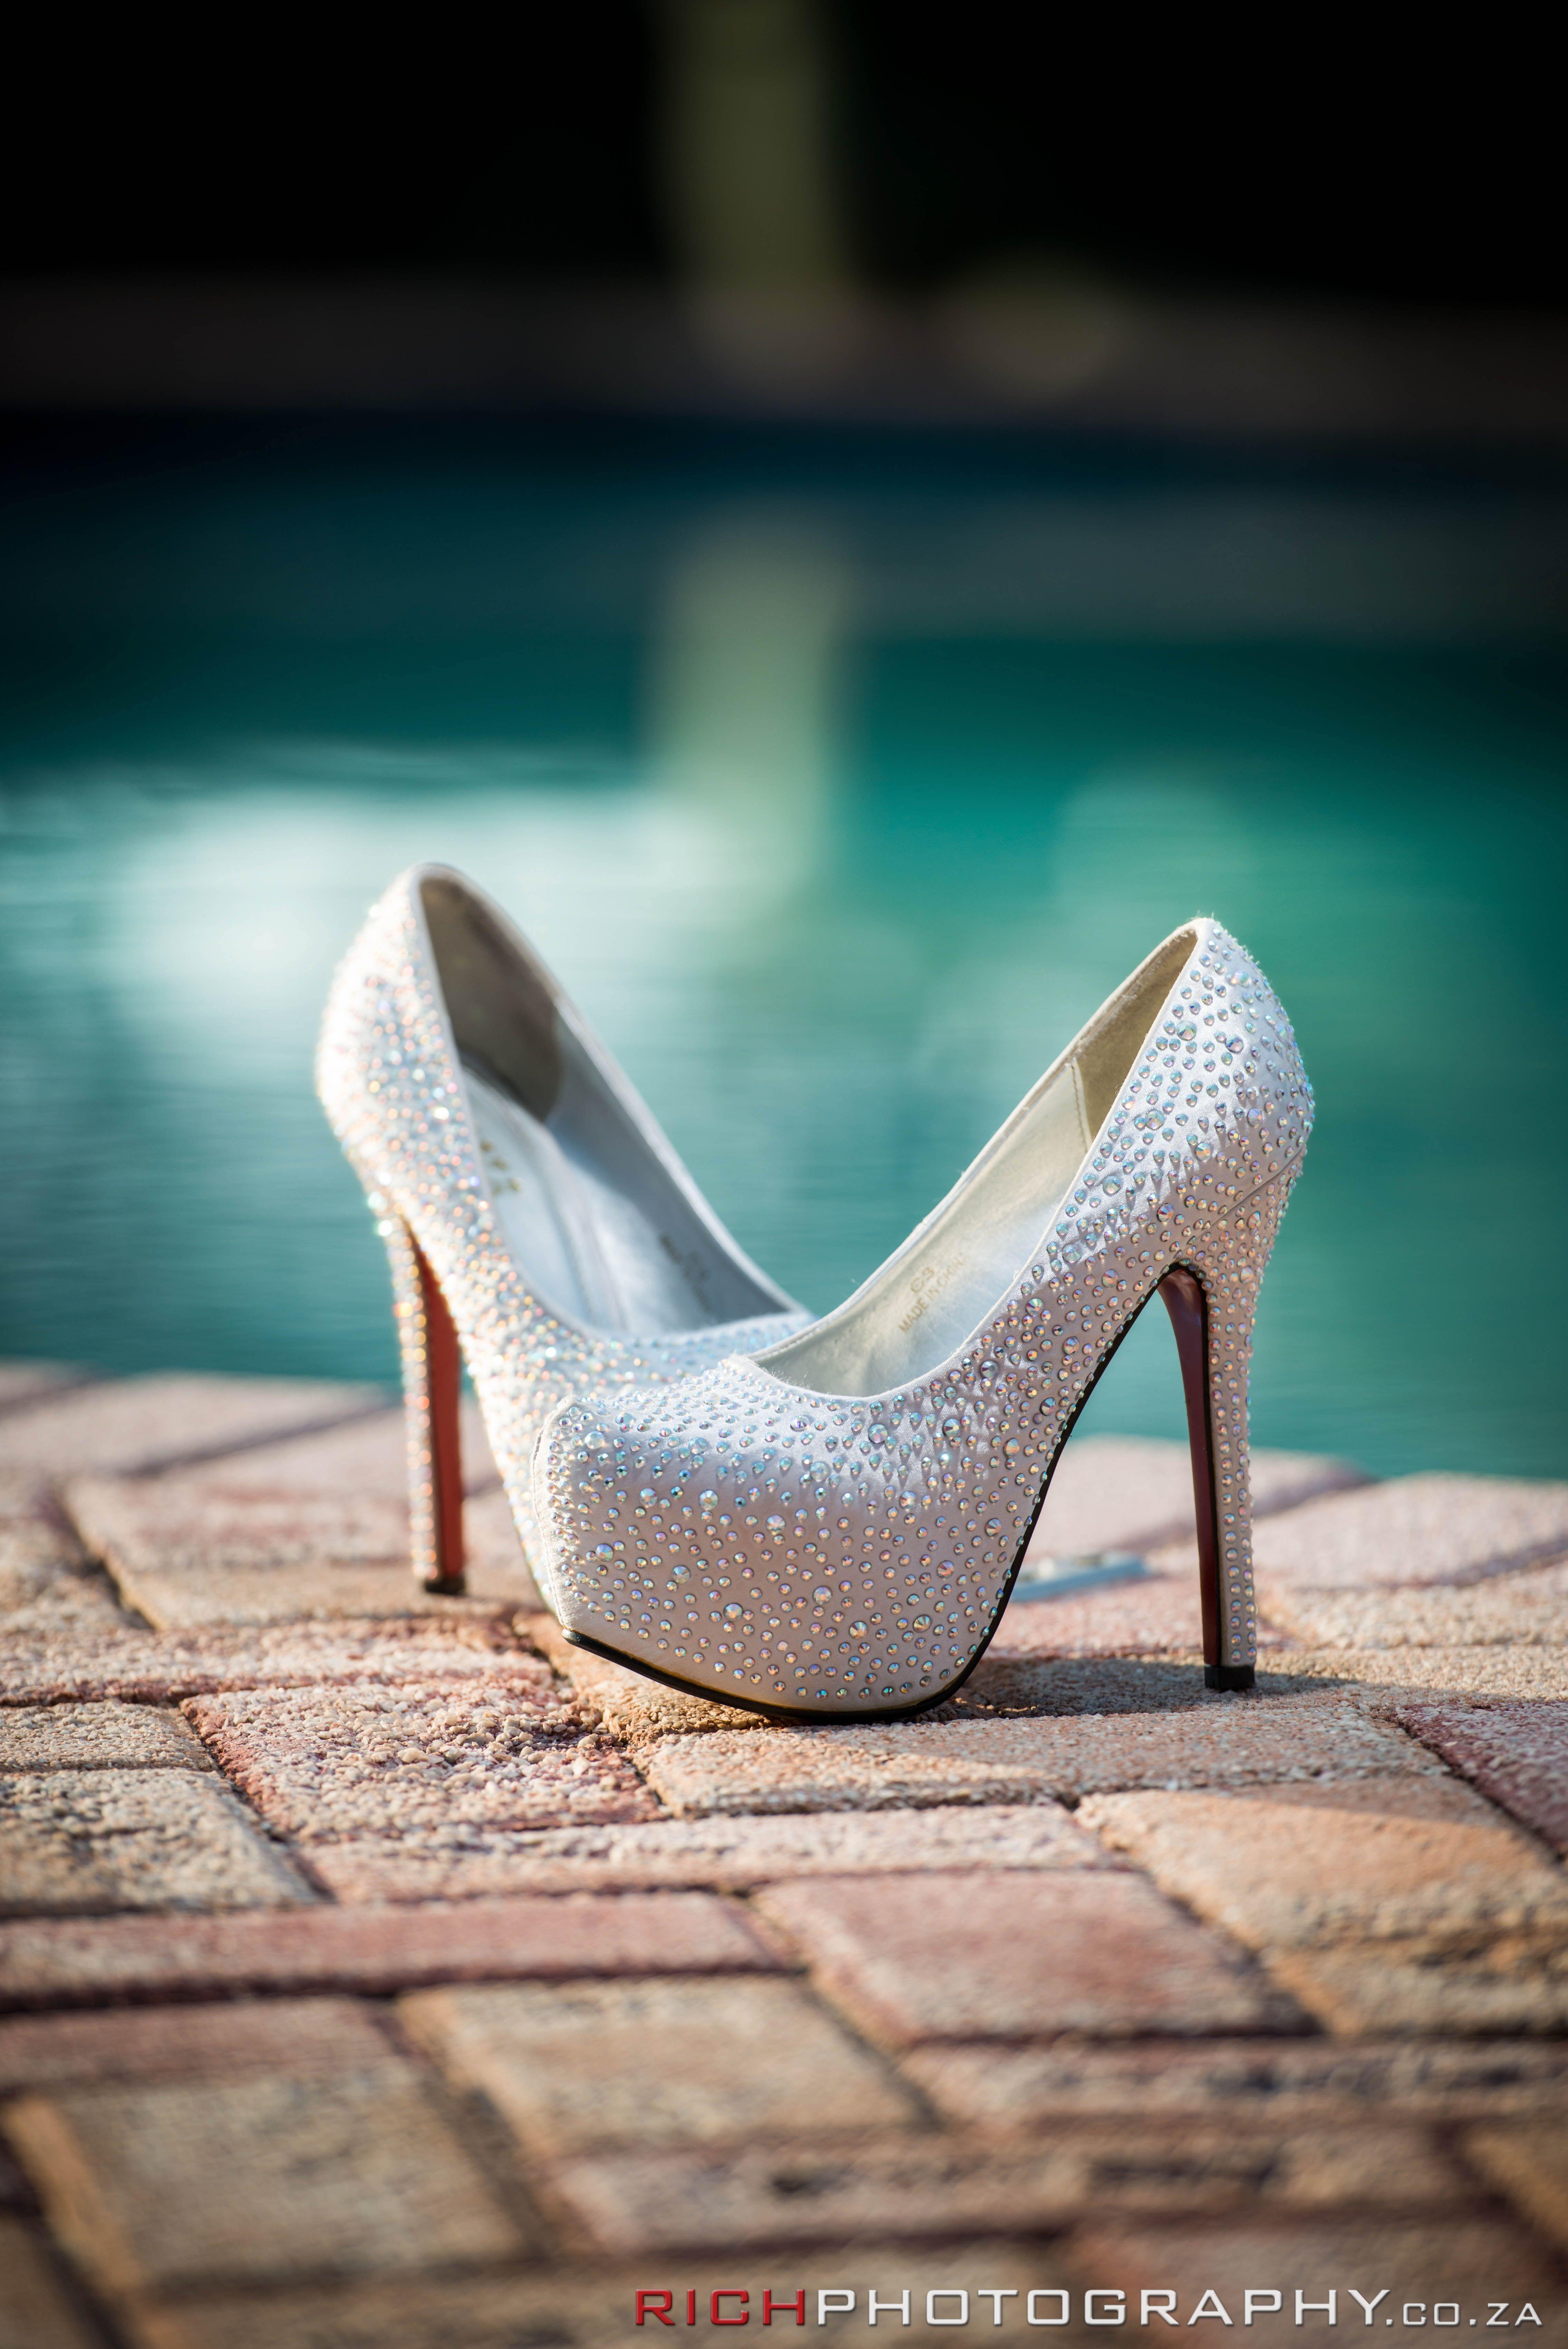 Stunning matric farewell shoes bling heels heaven photography by stunning matric farewell shoes bling heels heaven photography by rich photography thecheapjerseys Gallery